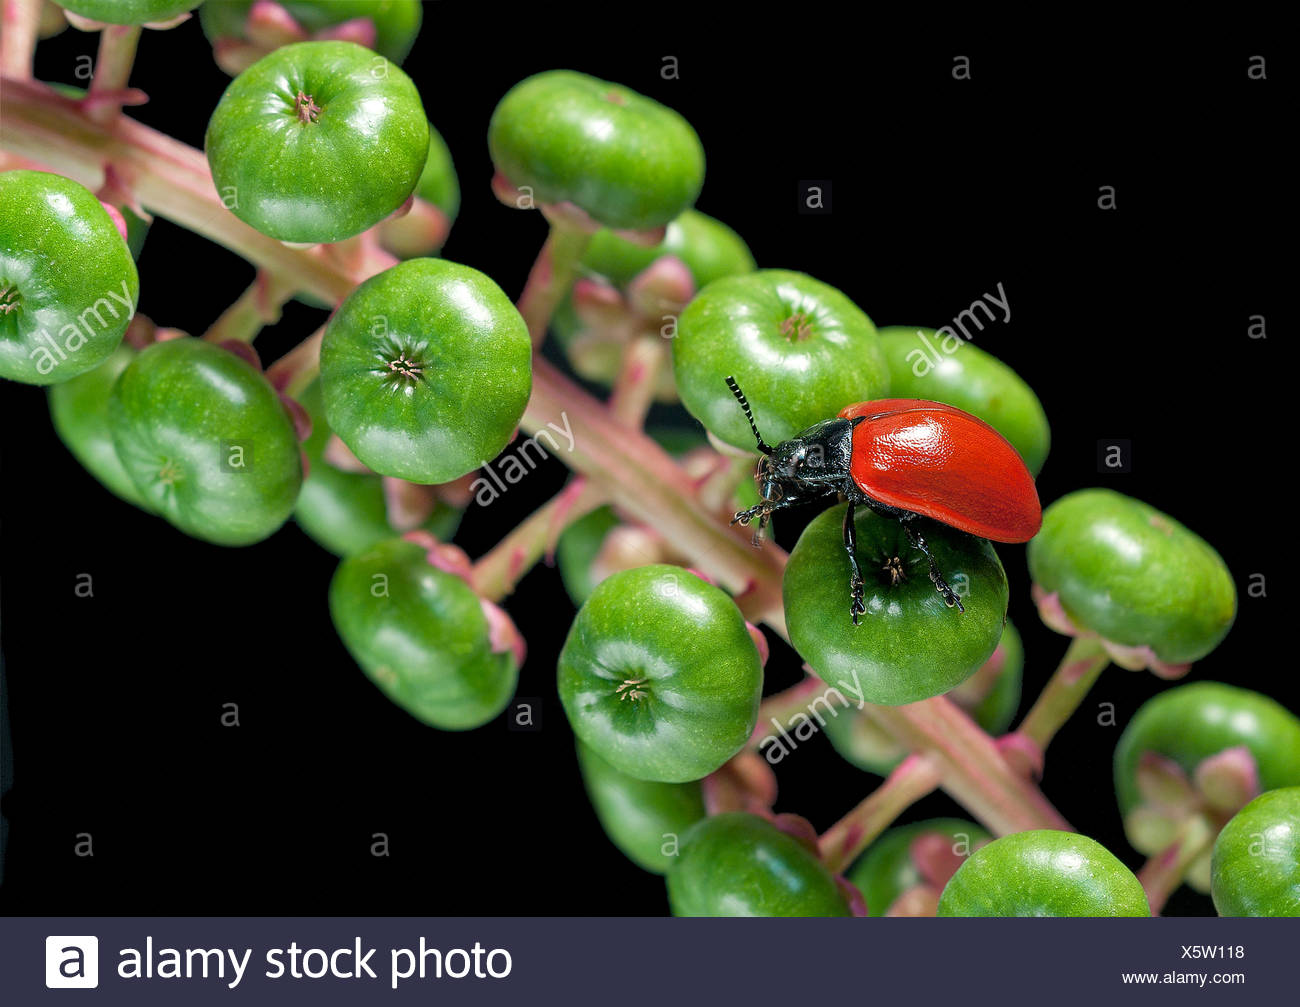 Melasoma populi on pokeweed berries - Stock Image